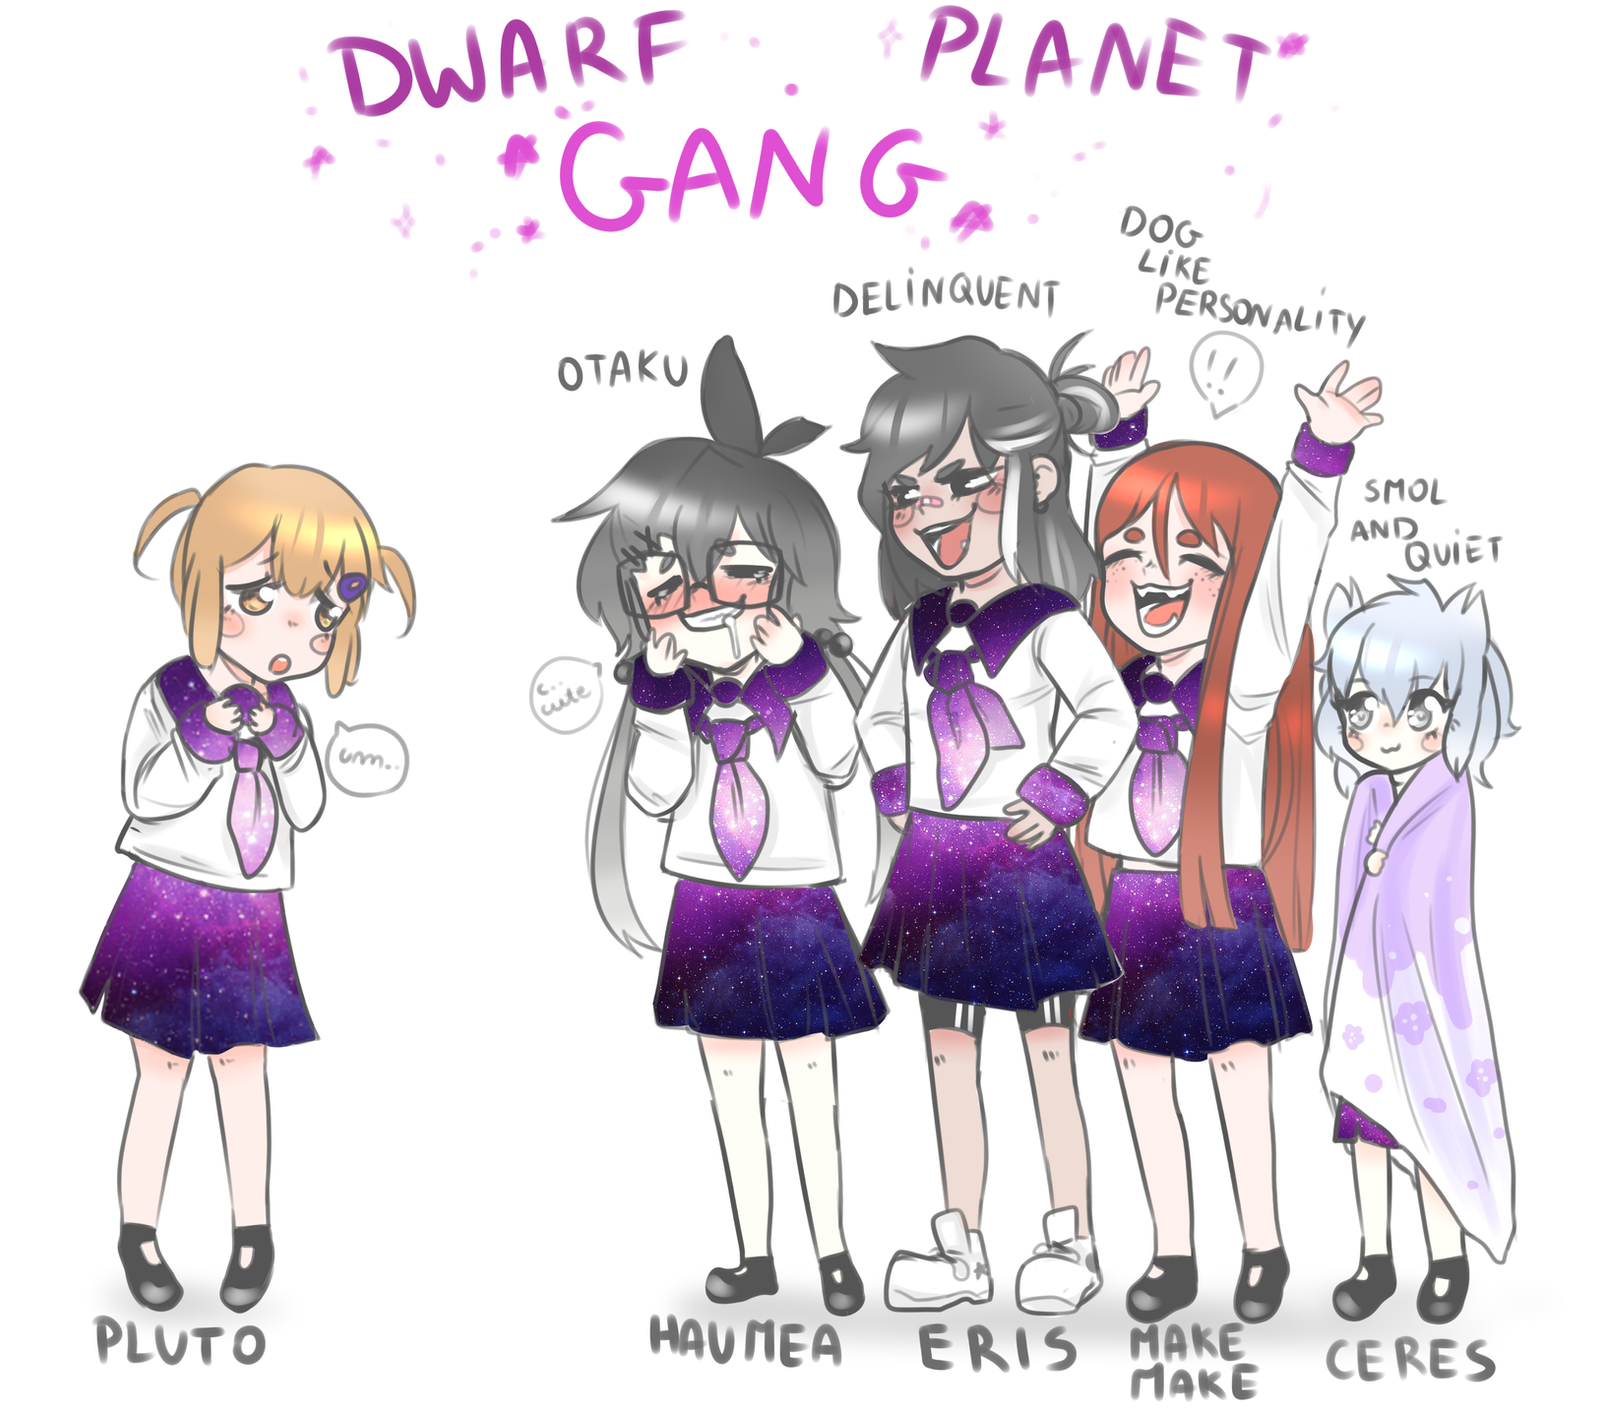 Dwarf Planet Gang by Ovxy on DeviantArt